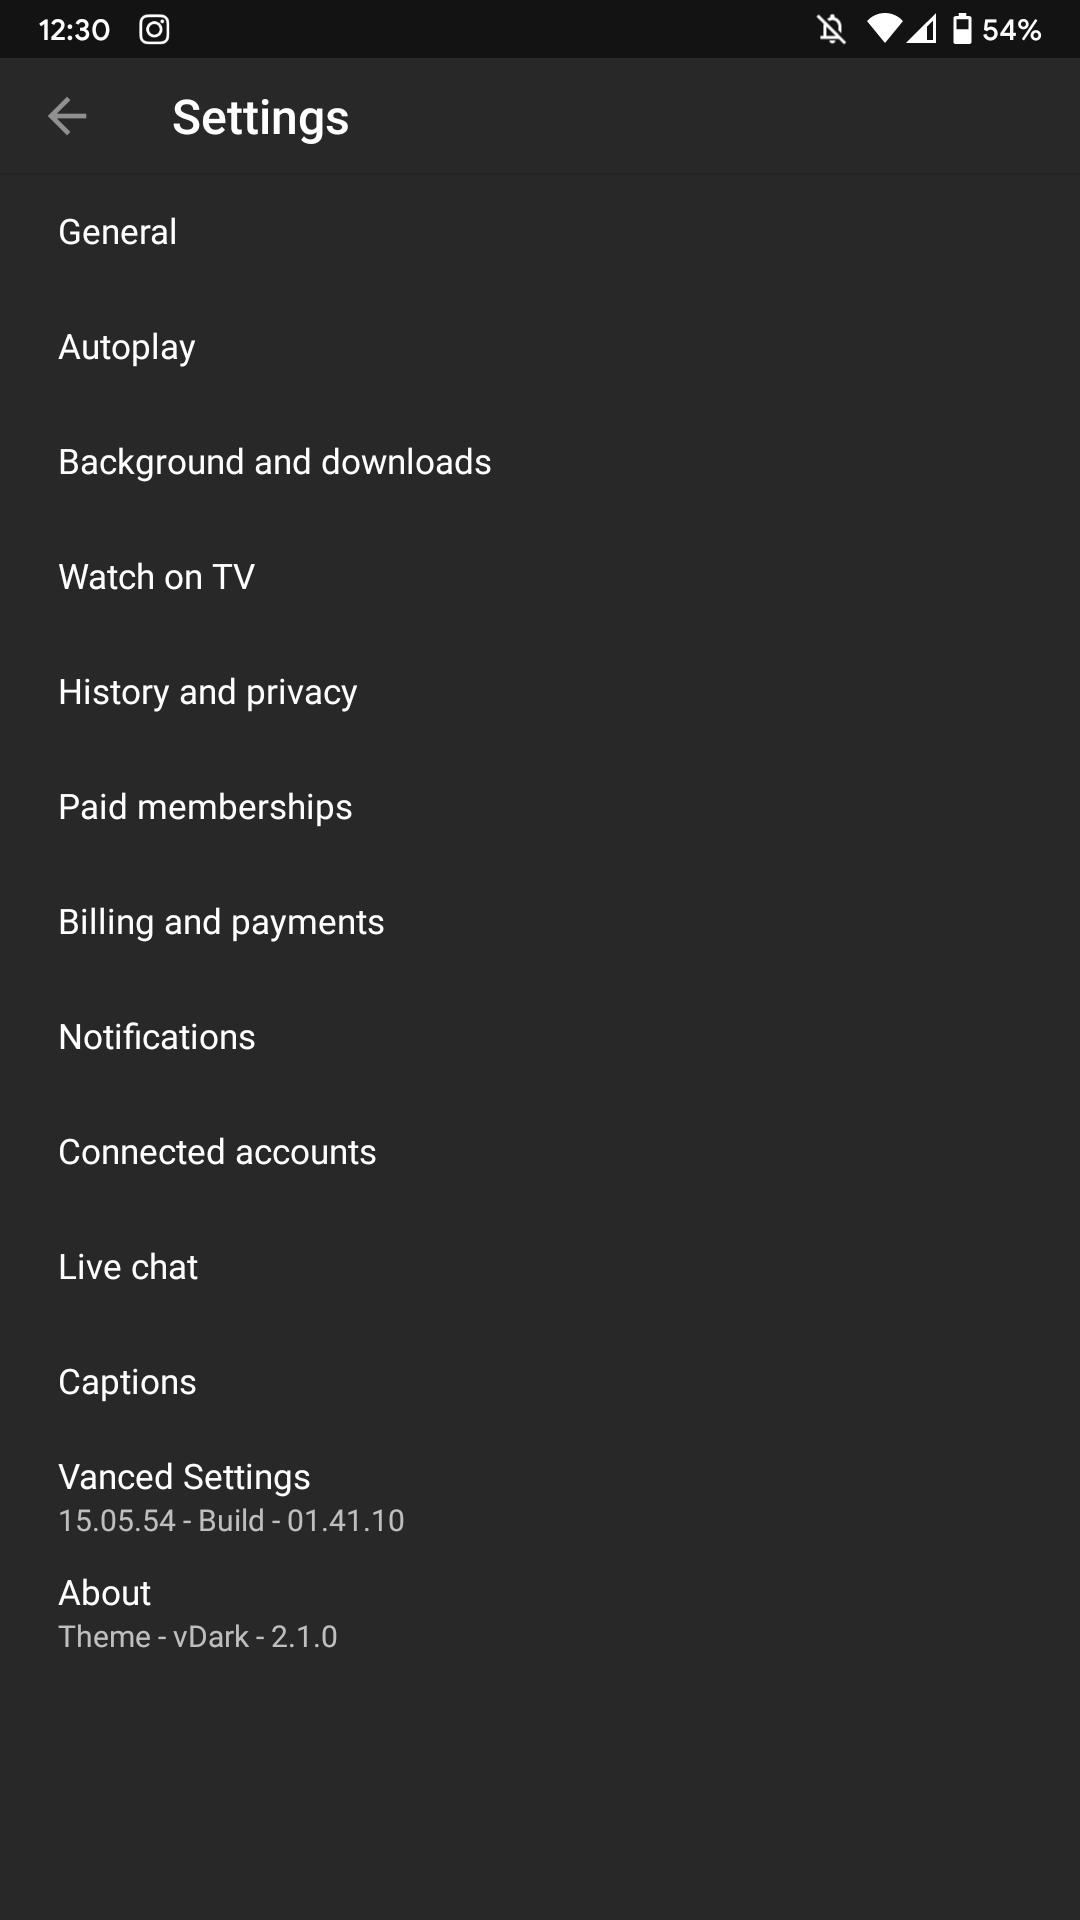 YouTube Vanced Settings